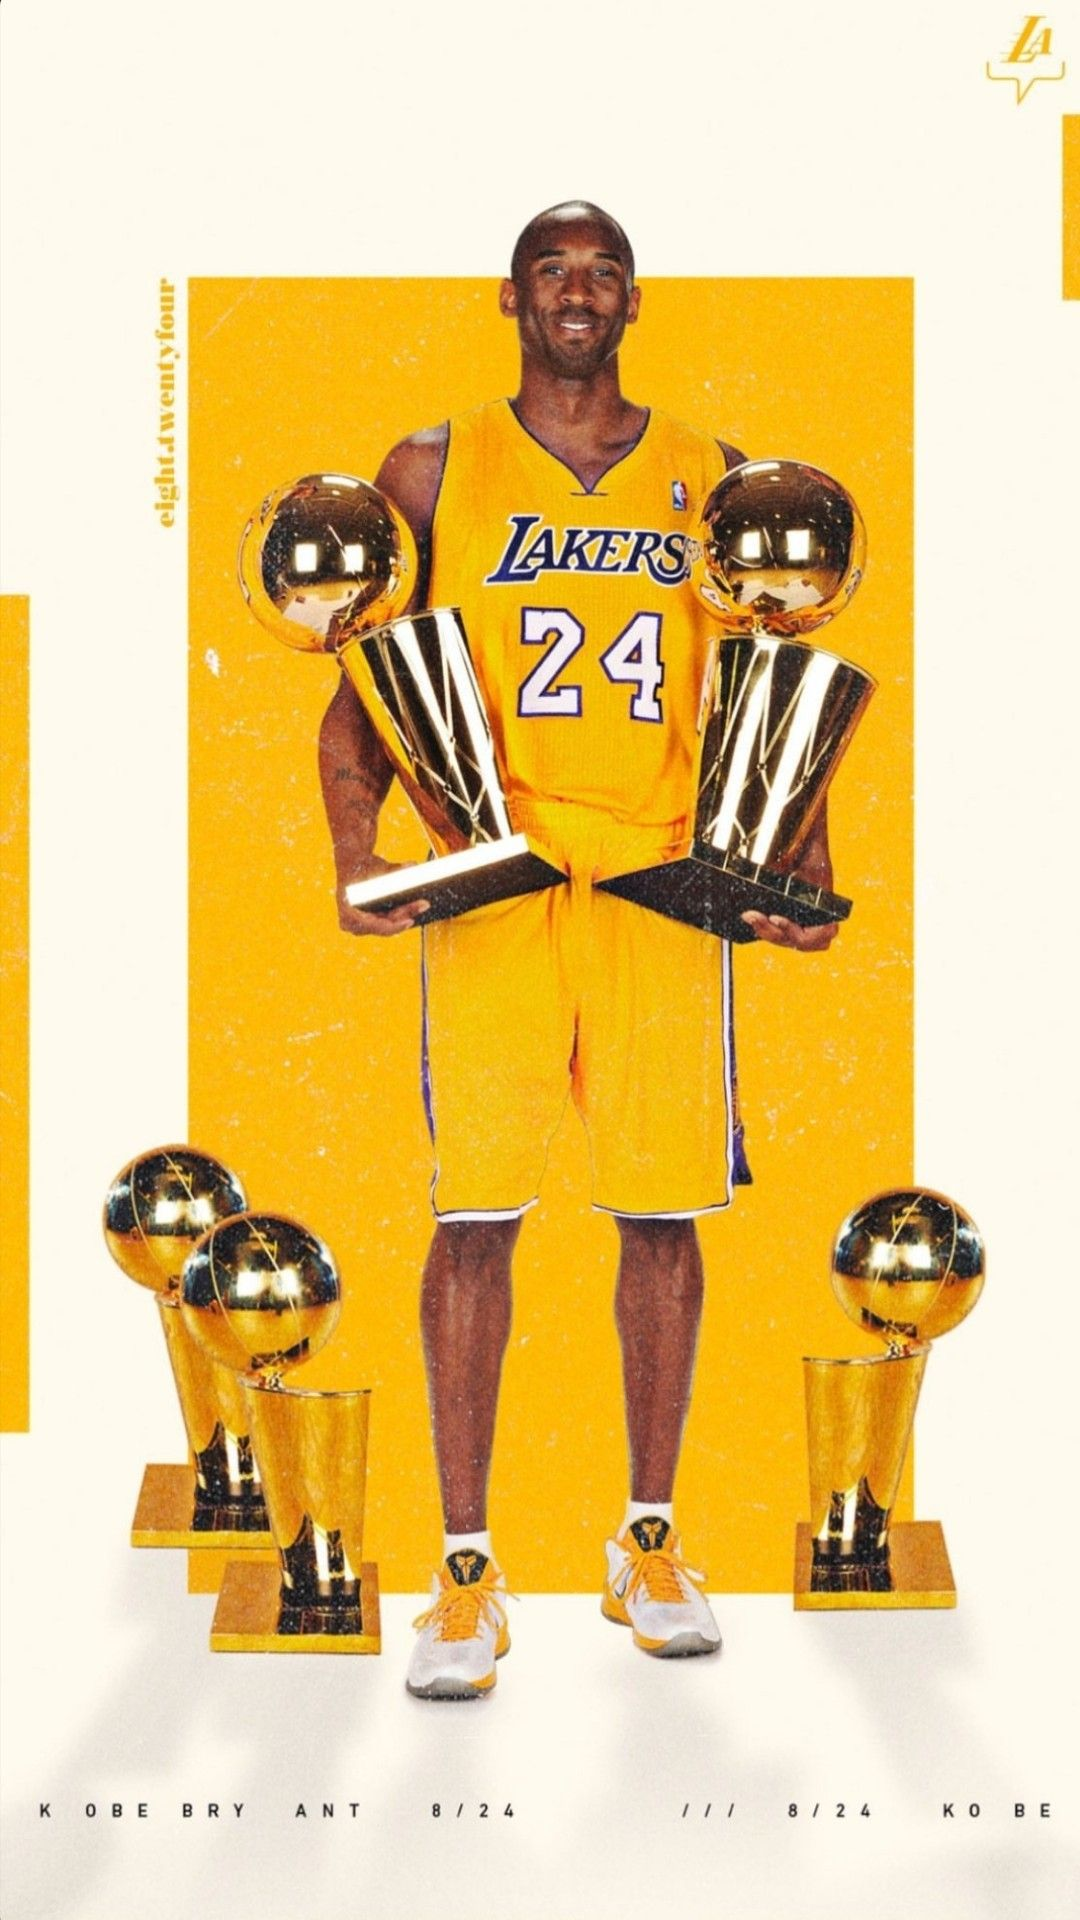 Kobe Bryant Wallpaper Kobe Bryant Pictures Kobe Bryant Poster Kobe Bryant Wallpaper